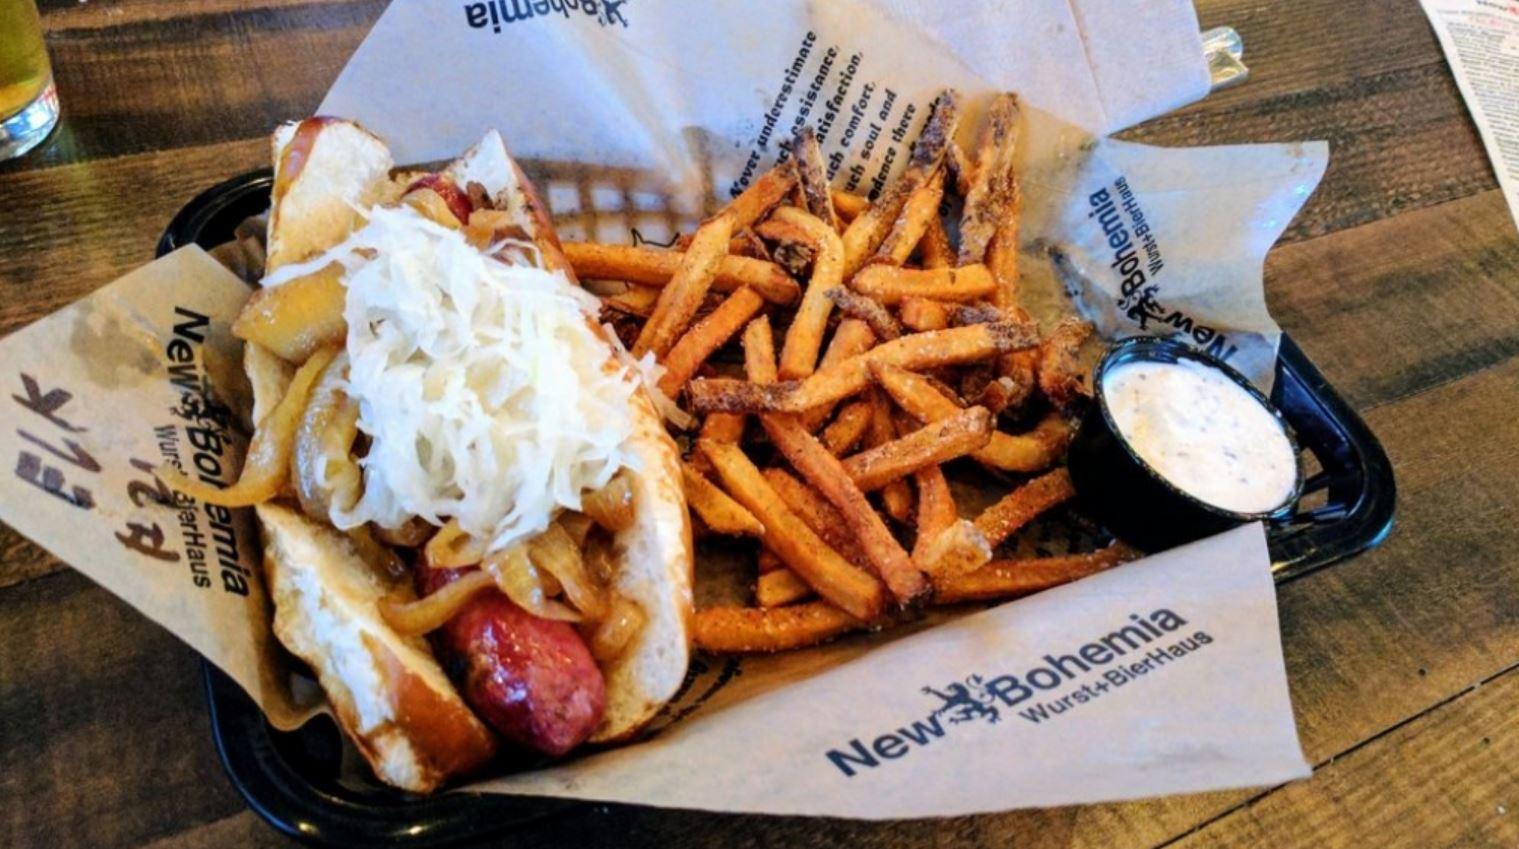 New Bohemia Sausage and Fries